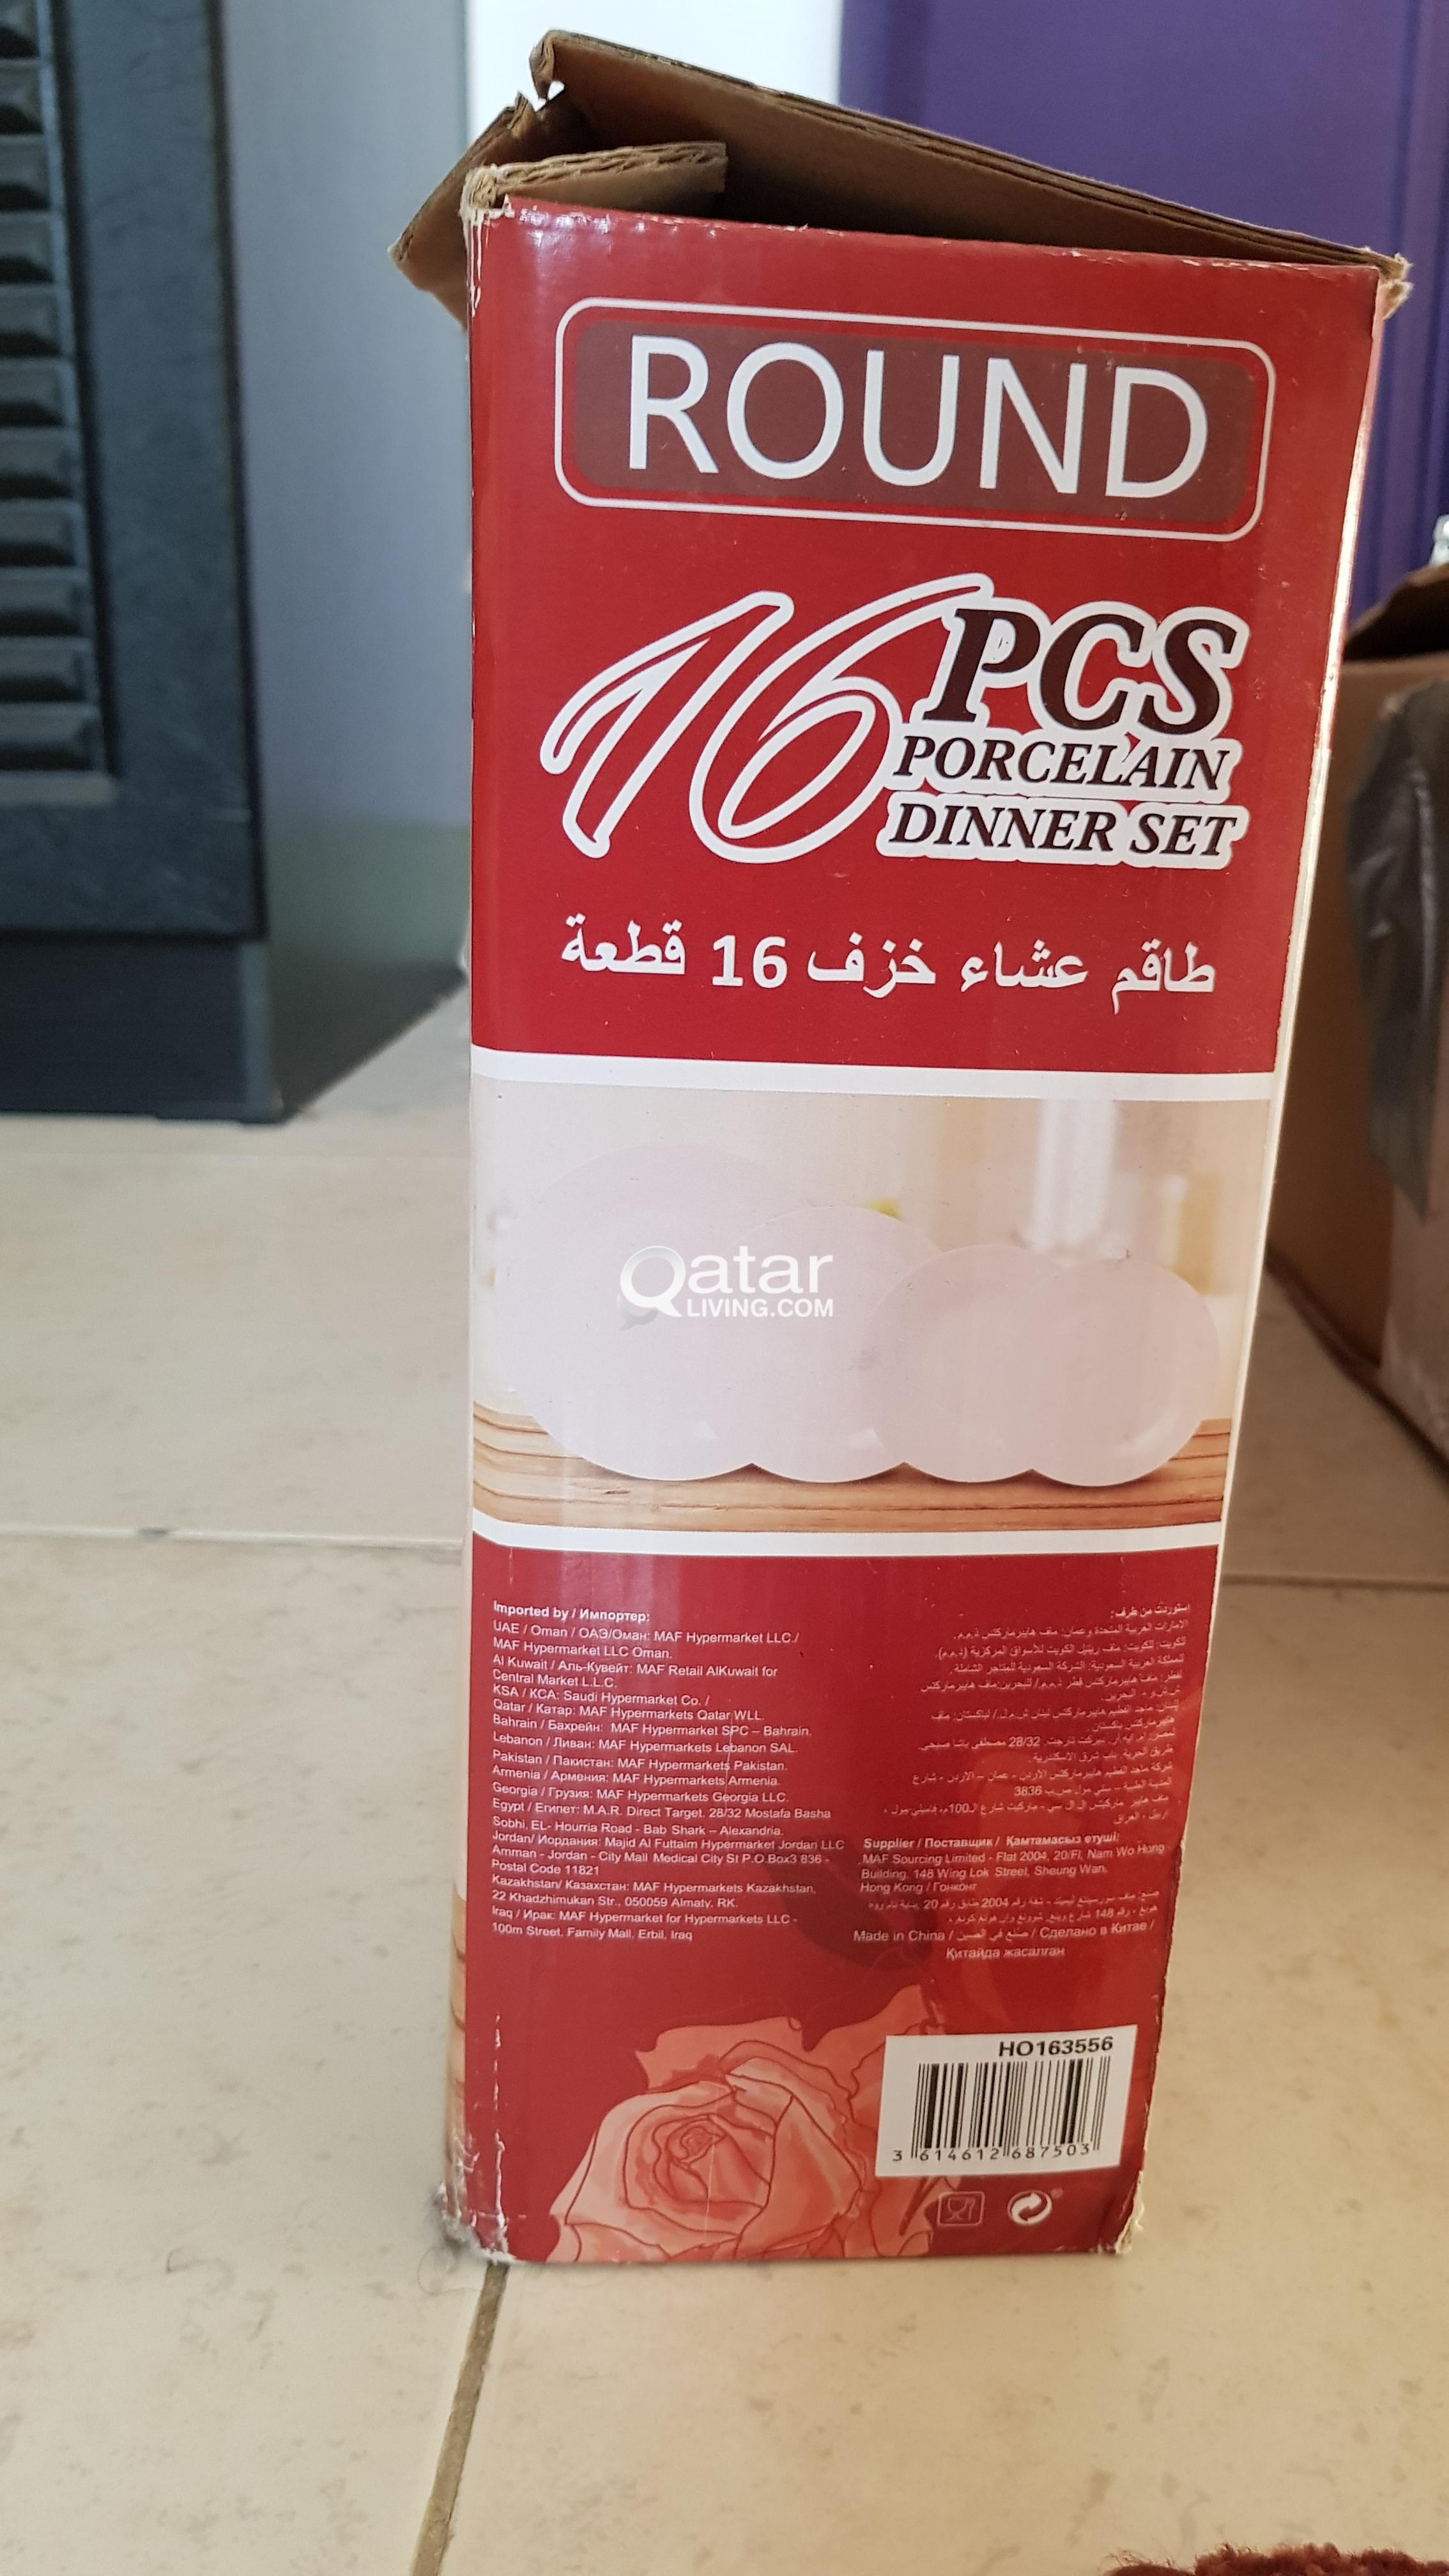 Porcelain dinner set (12 pcs) | Qatar Living